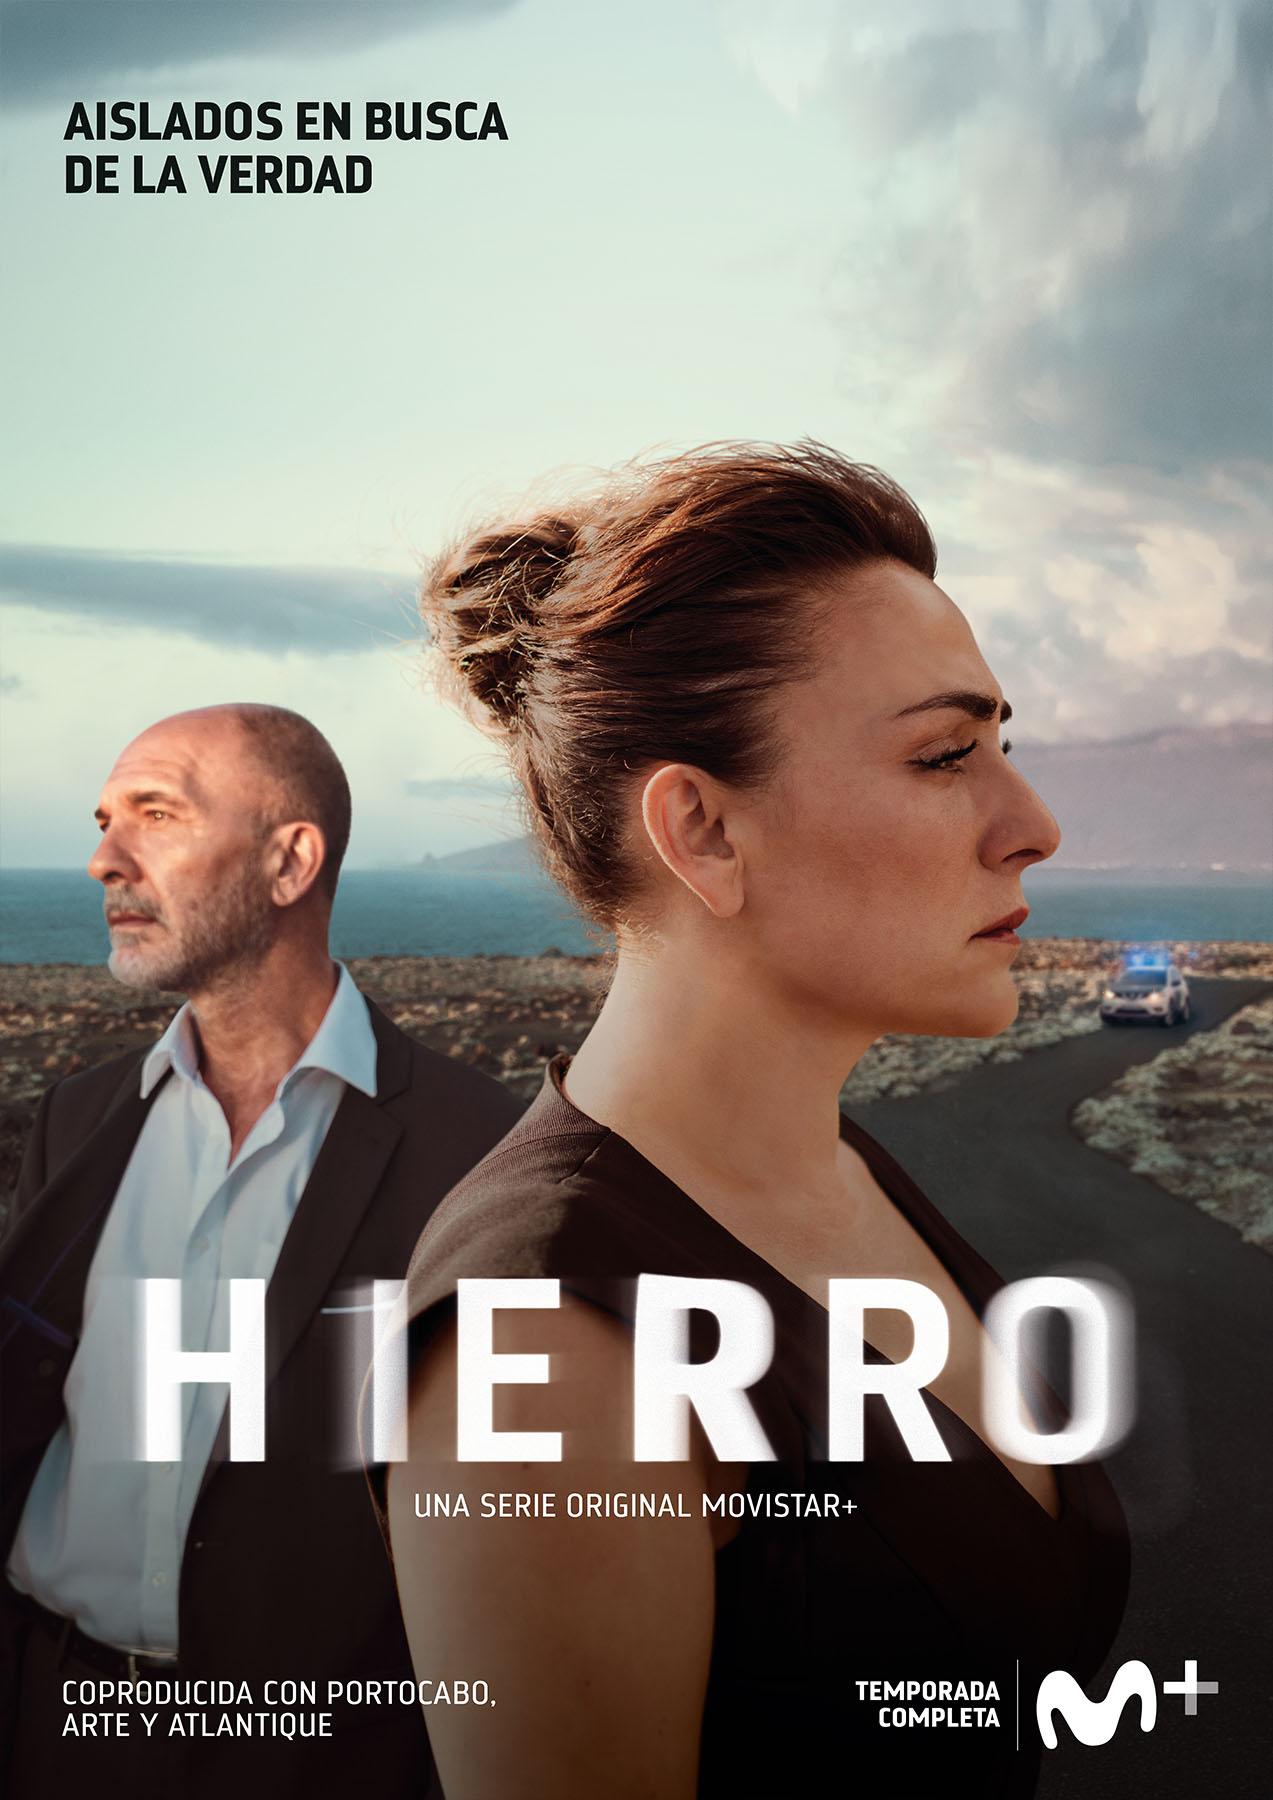 Hierro.S01E04.SPANiSH.1080p.HDTV.x264-FERiCE